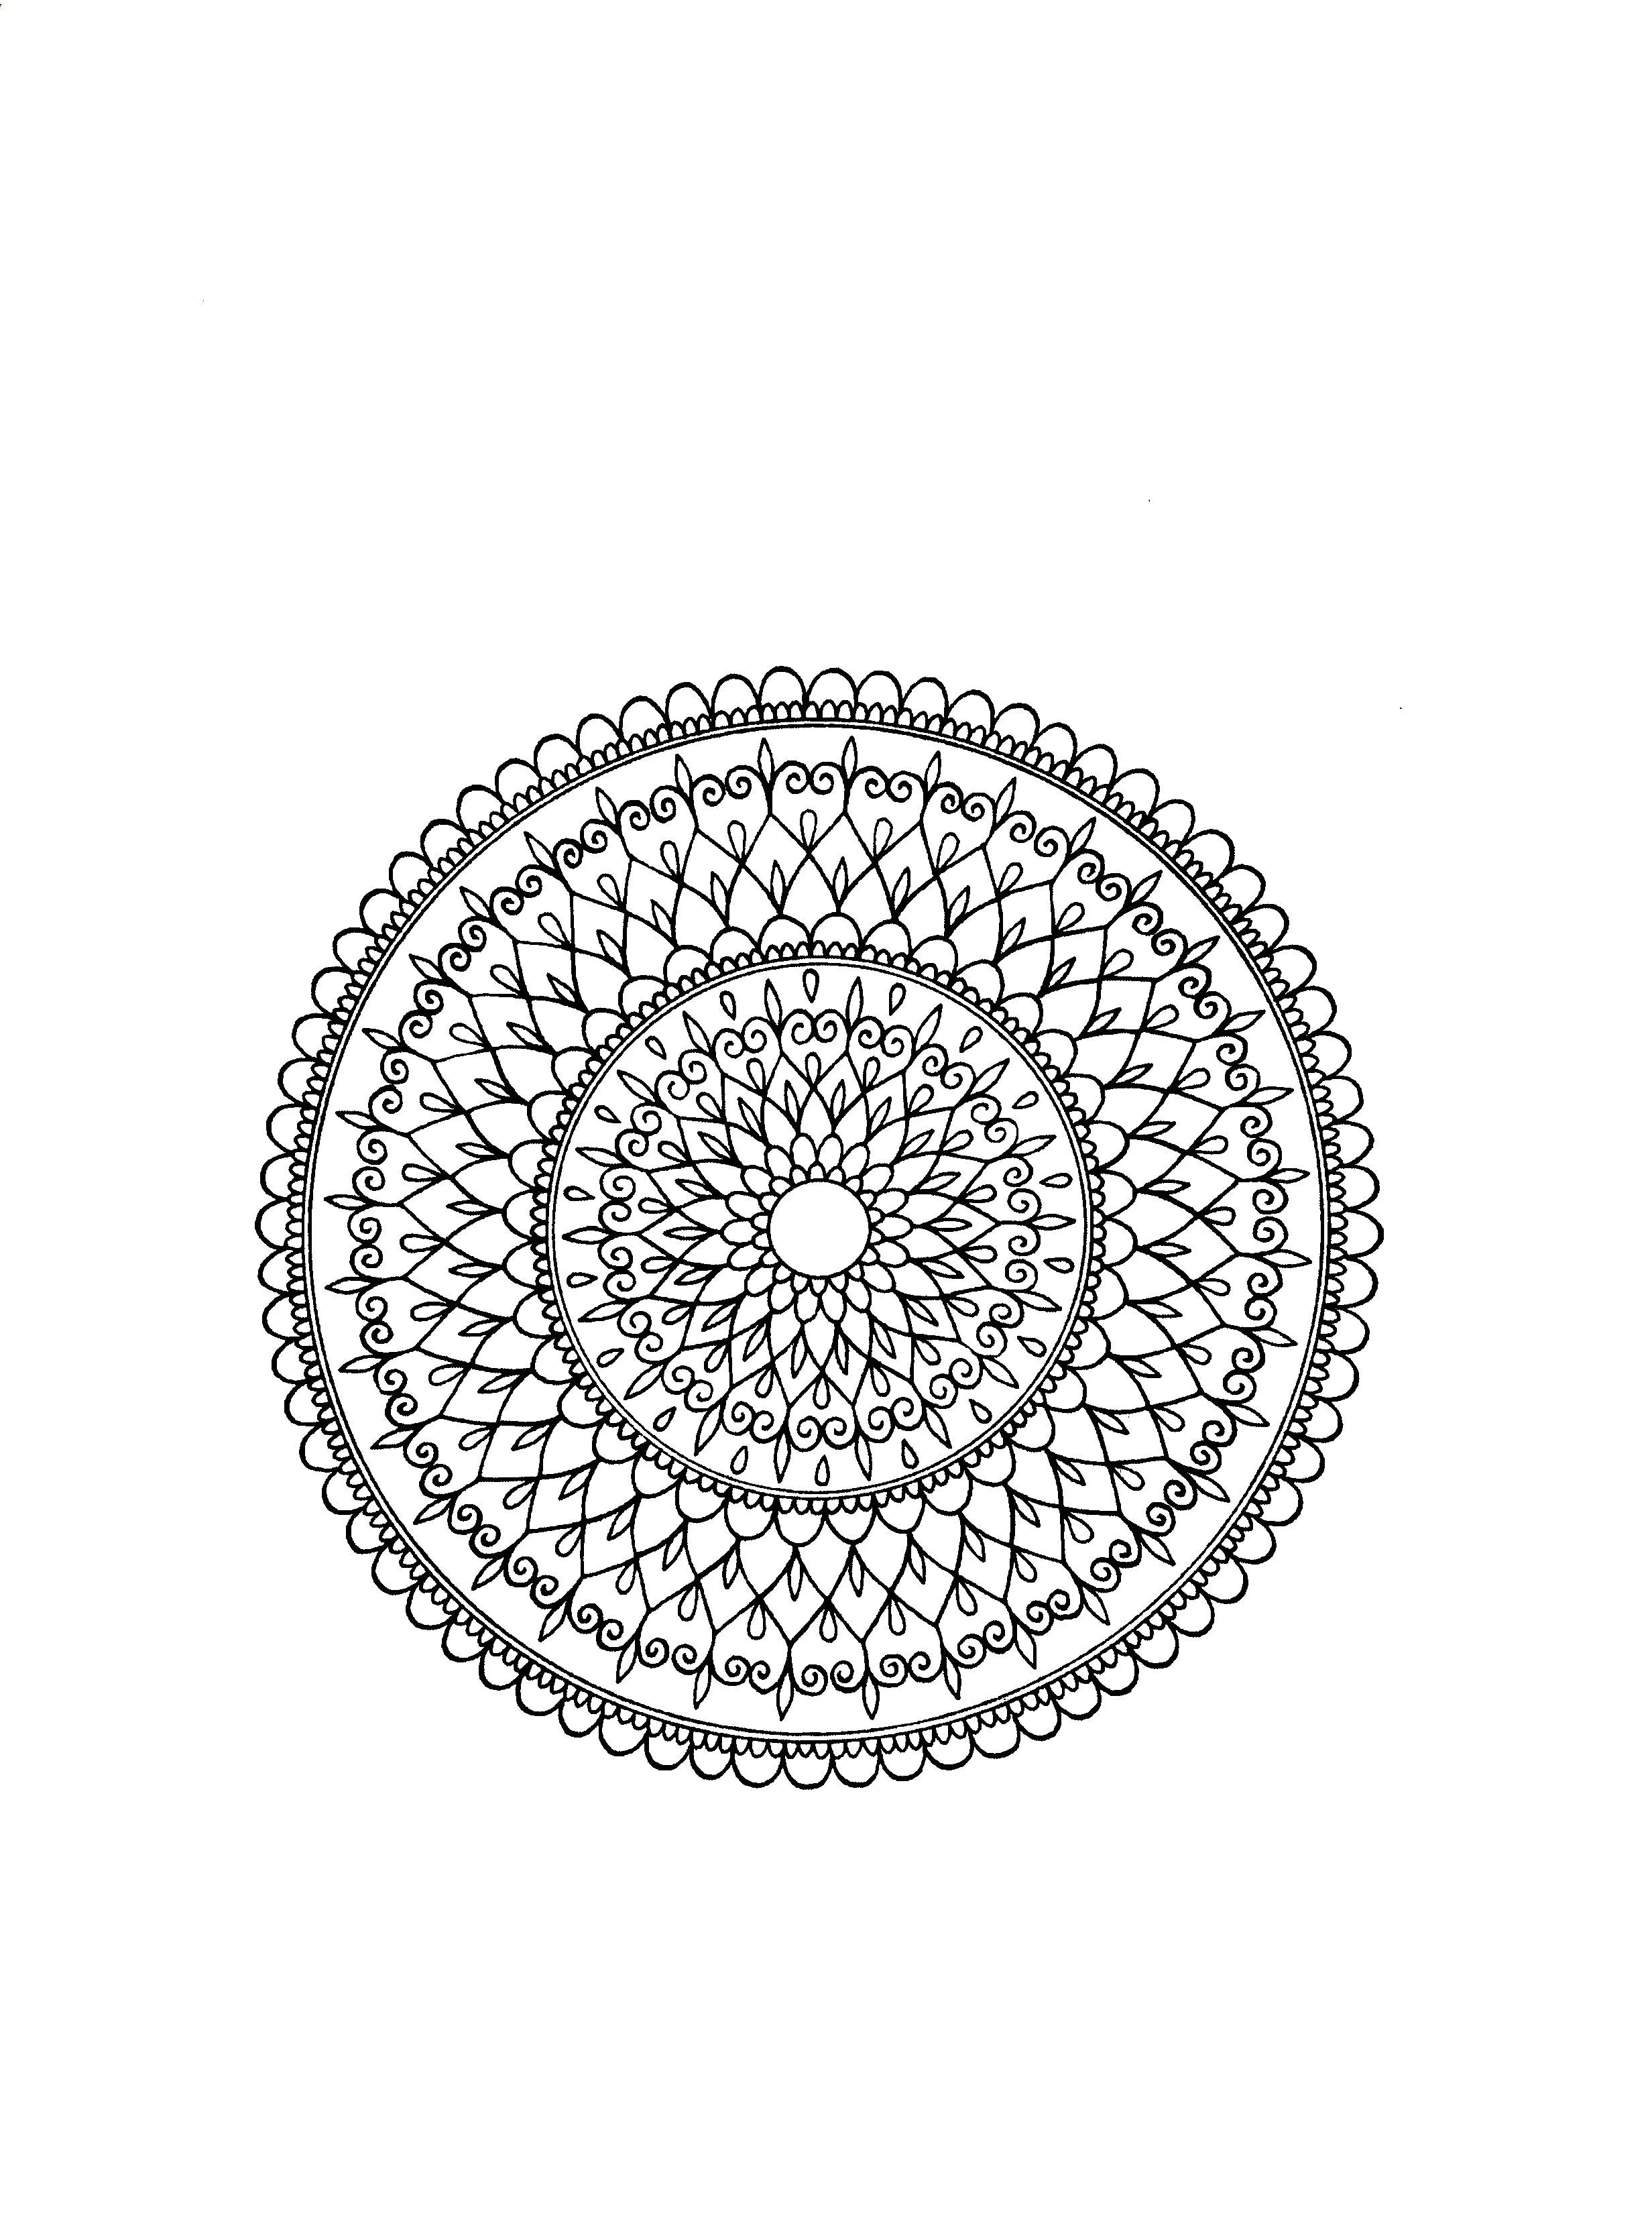 Draw A Simple Mandala Design By Zeeart